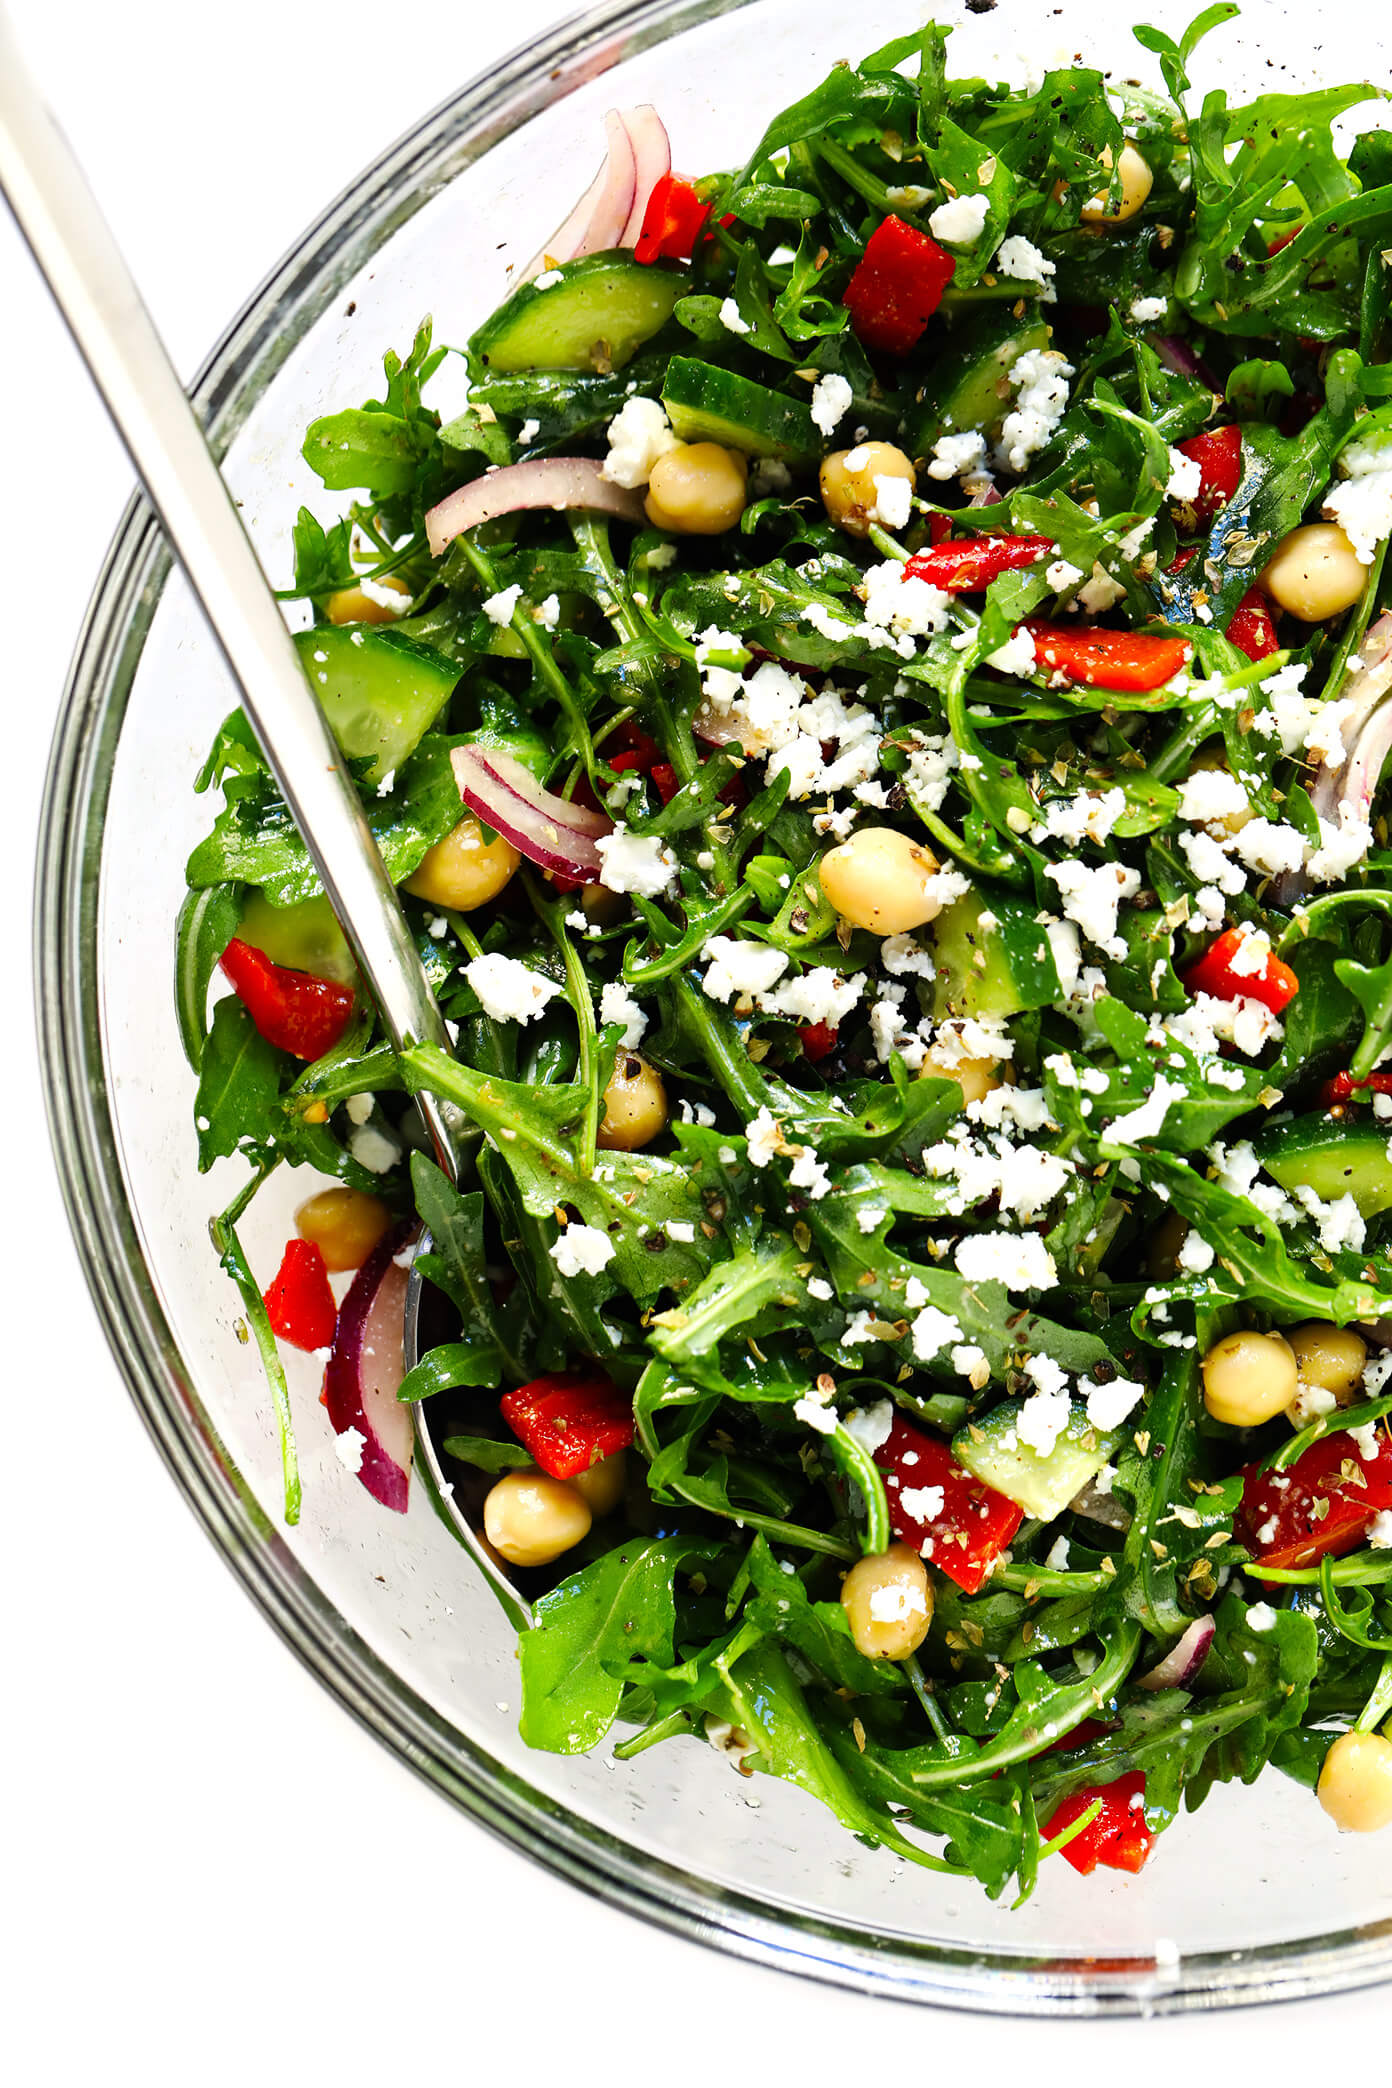 Mediterranean Salad with Arugula and Chickpeas